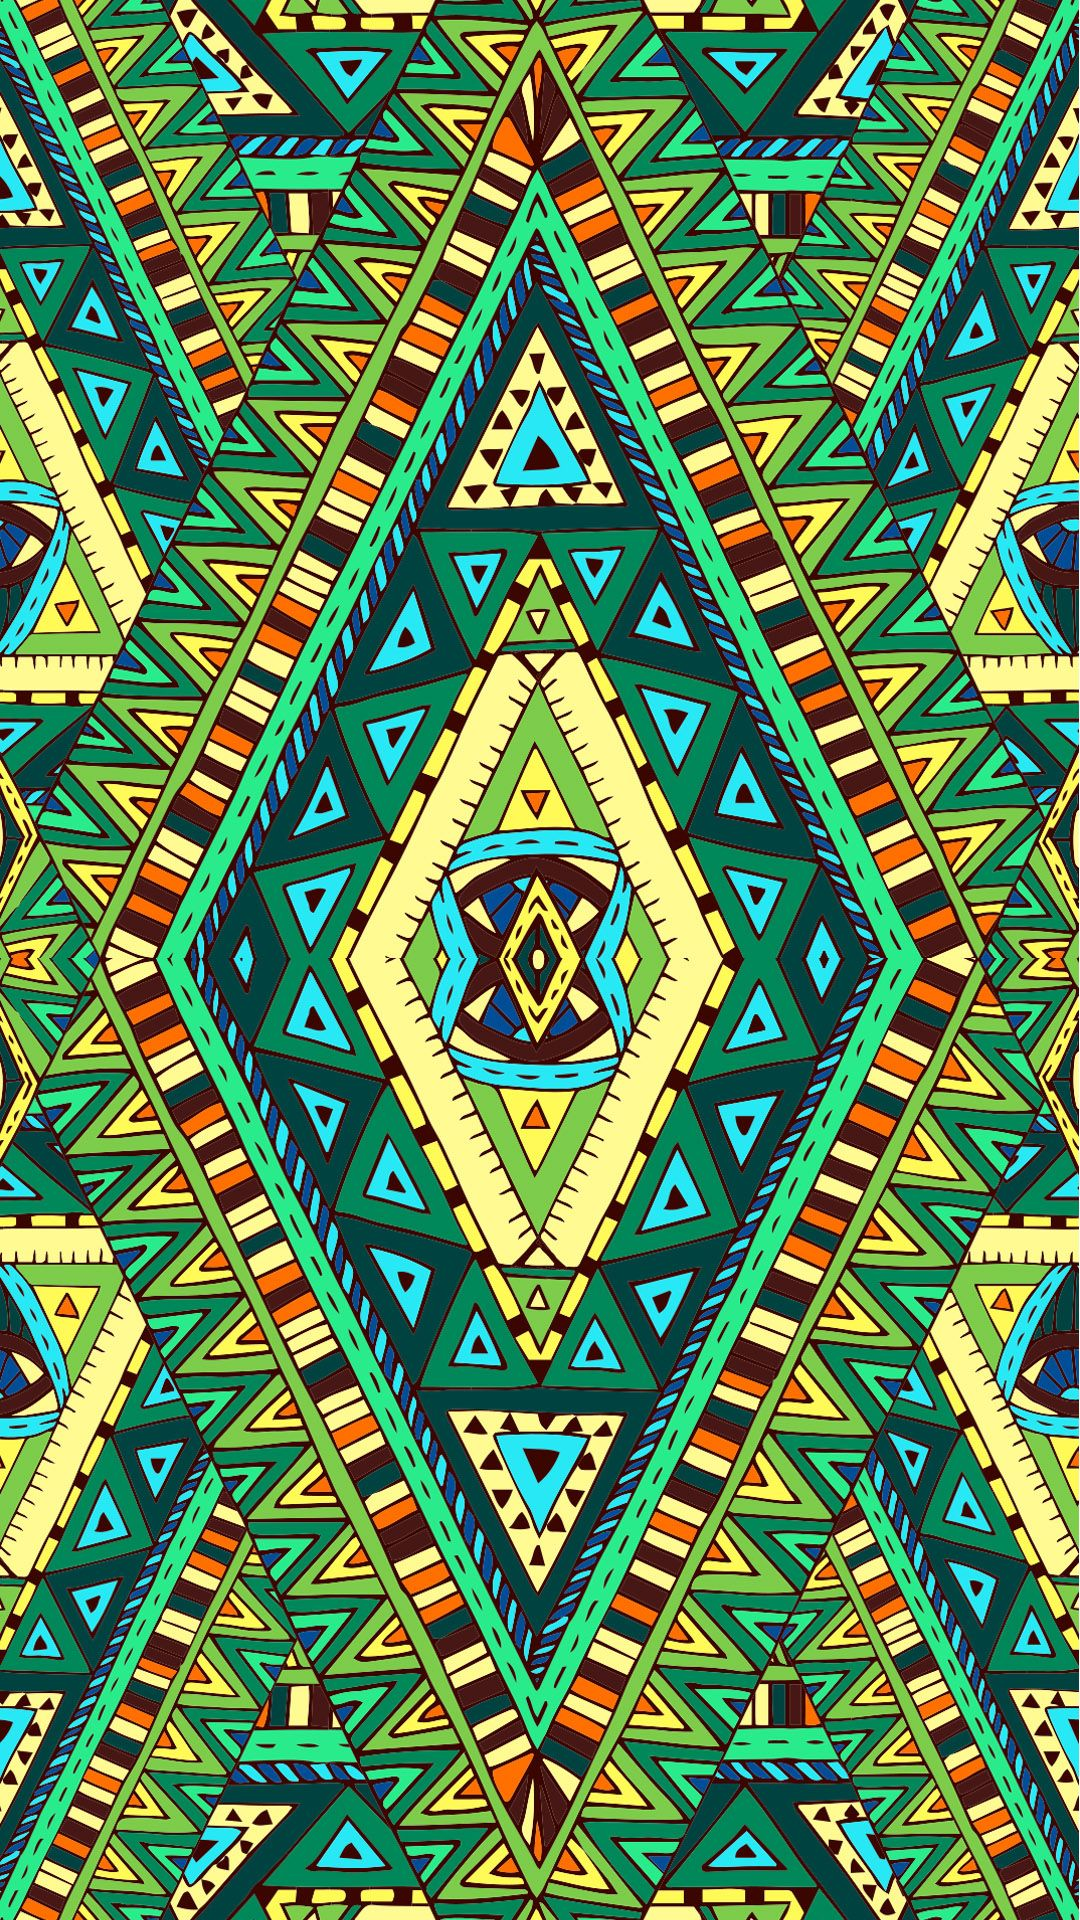 Ethnic iphone wallpaper - Etnik Desen Sevenler I In Renkli Wallpaperlar Ethnic Etnik Green Wallpaper